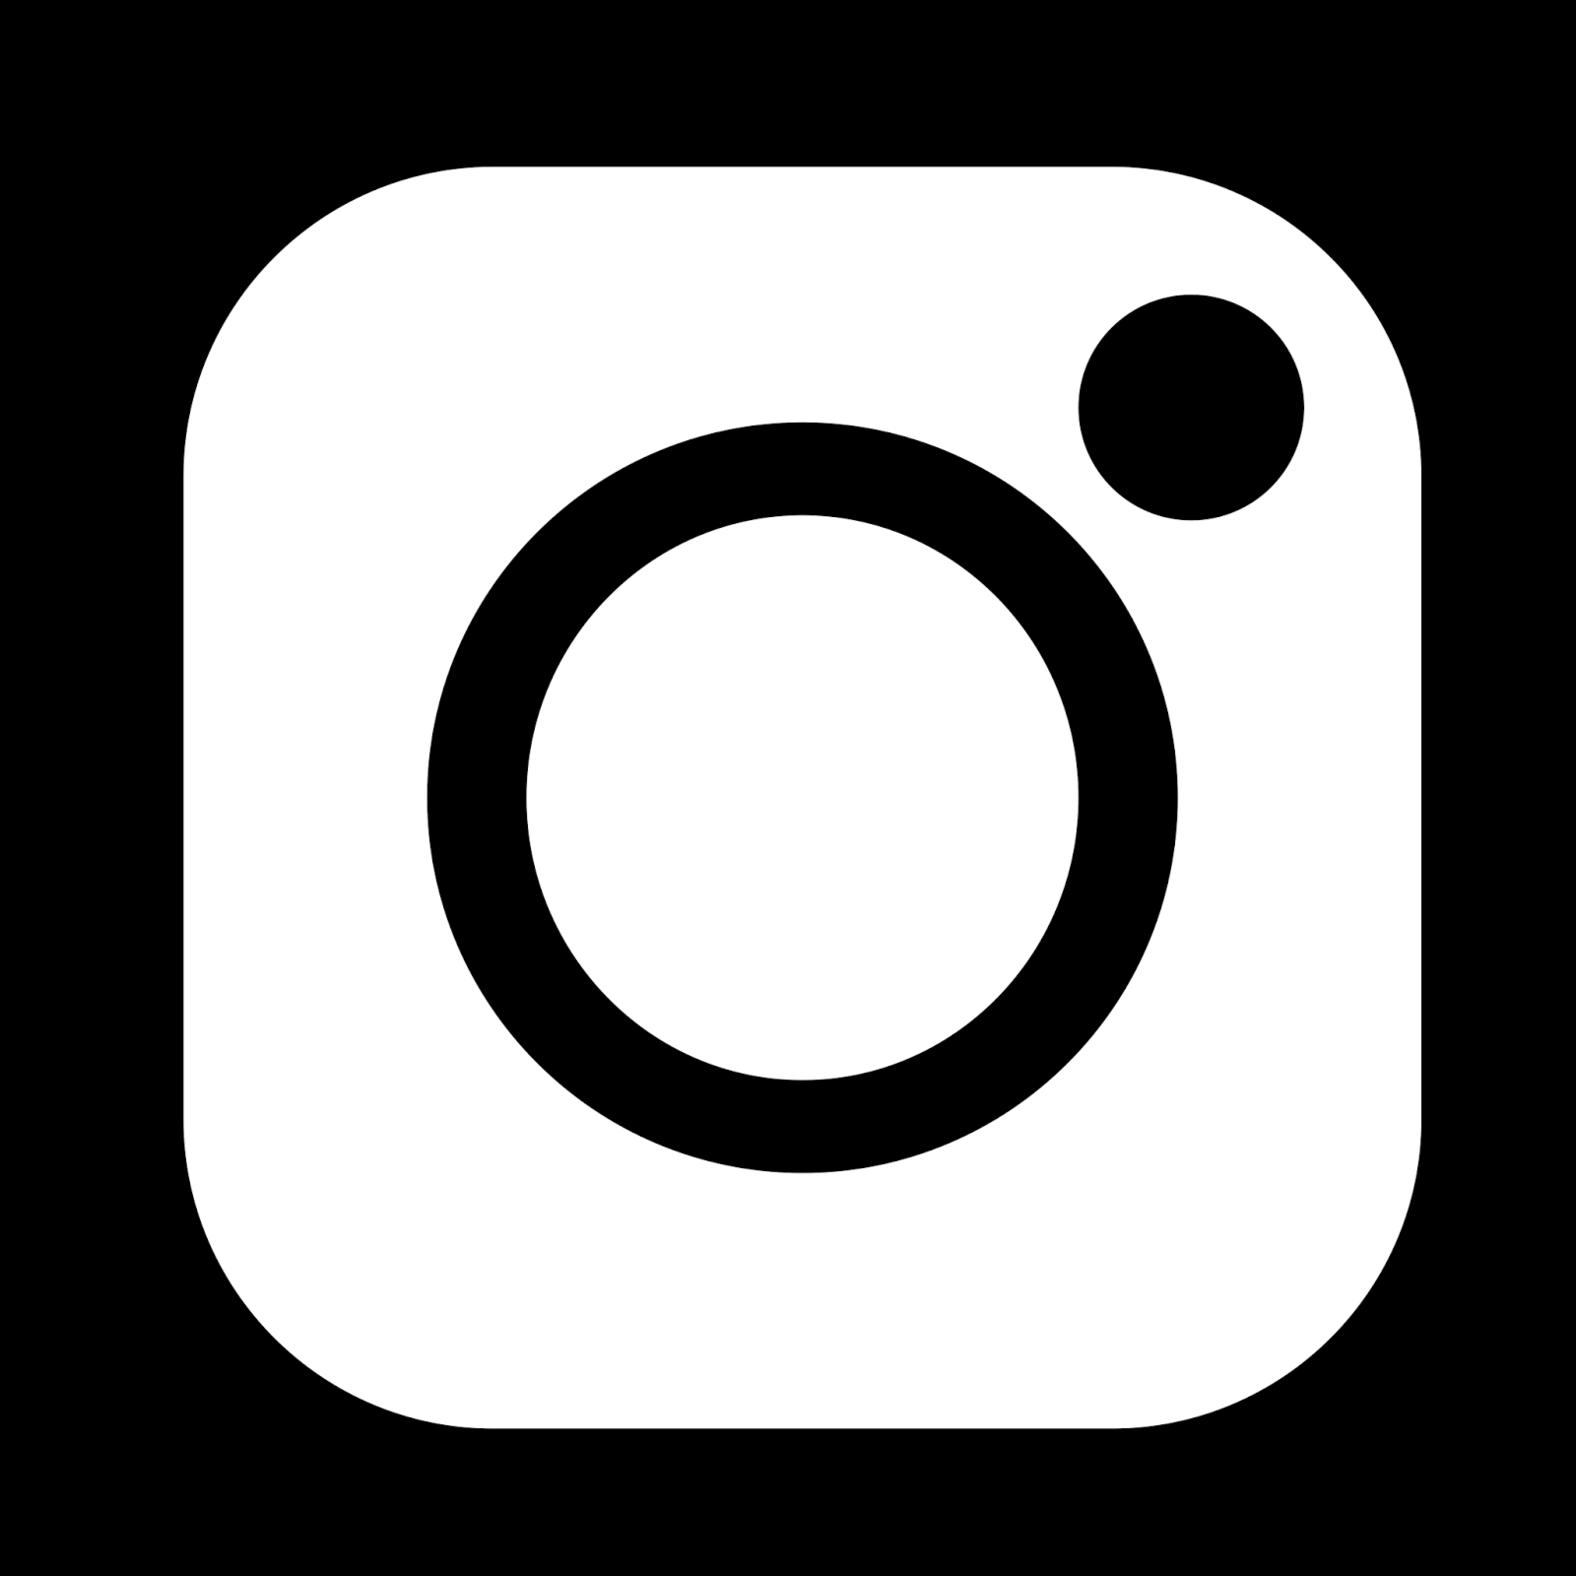 logo-instagram-modehaus-henken